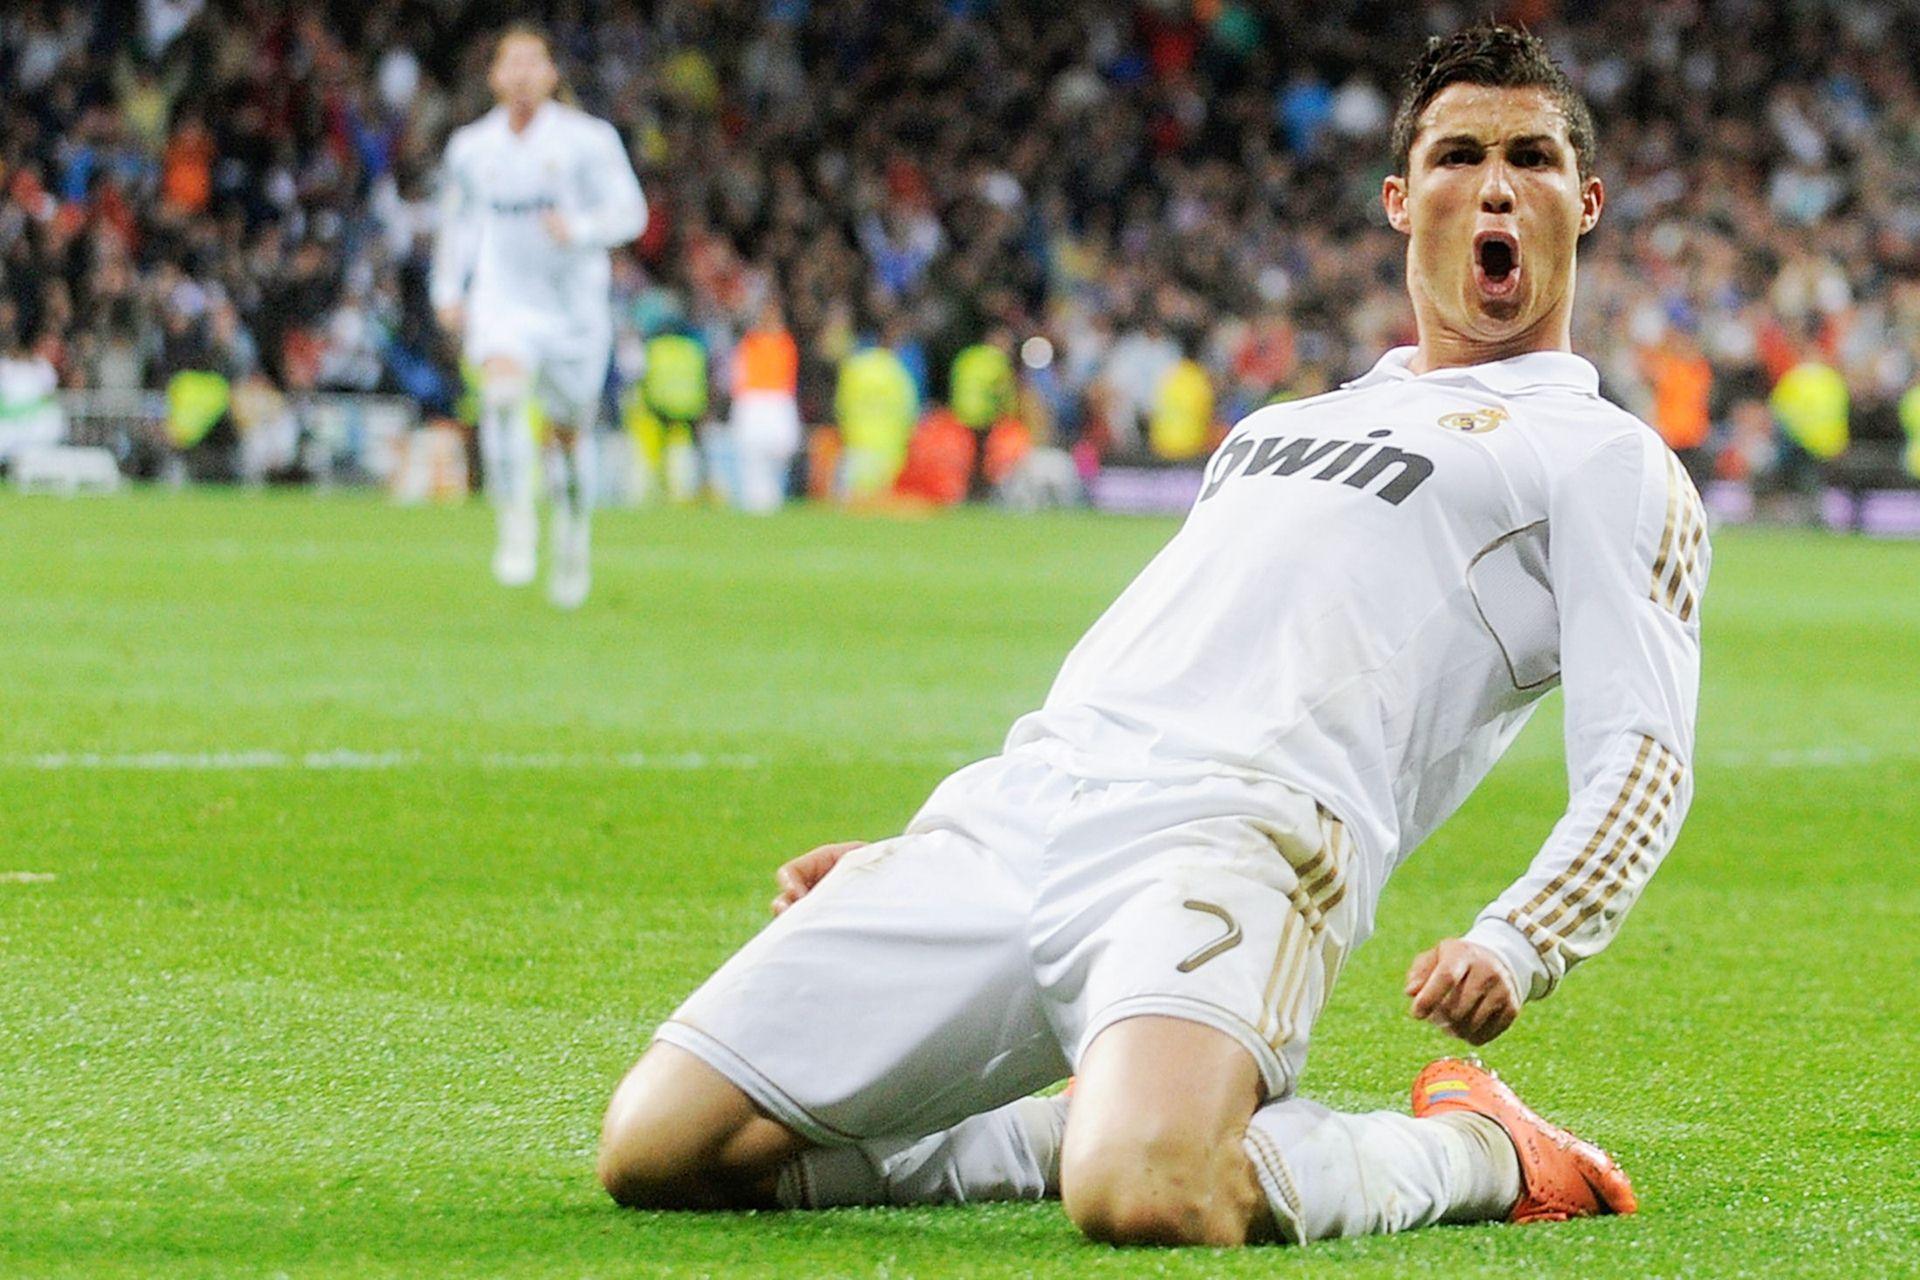 Cristiano Ronaldo Wallpapers HD A24